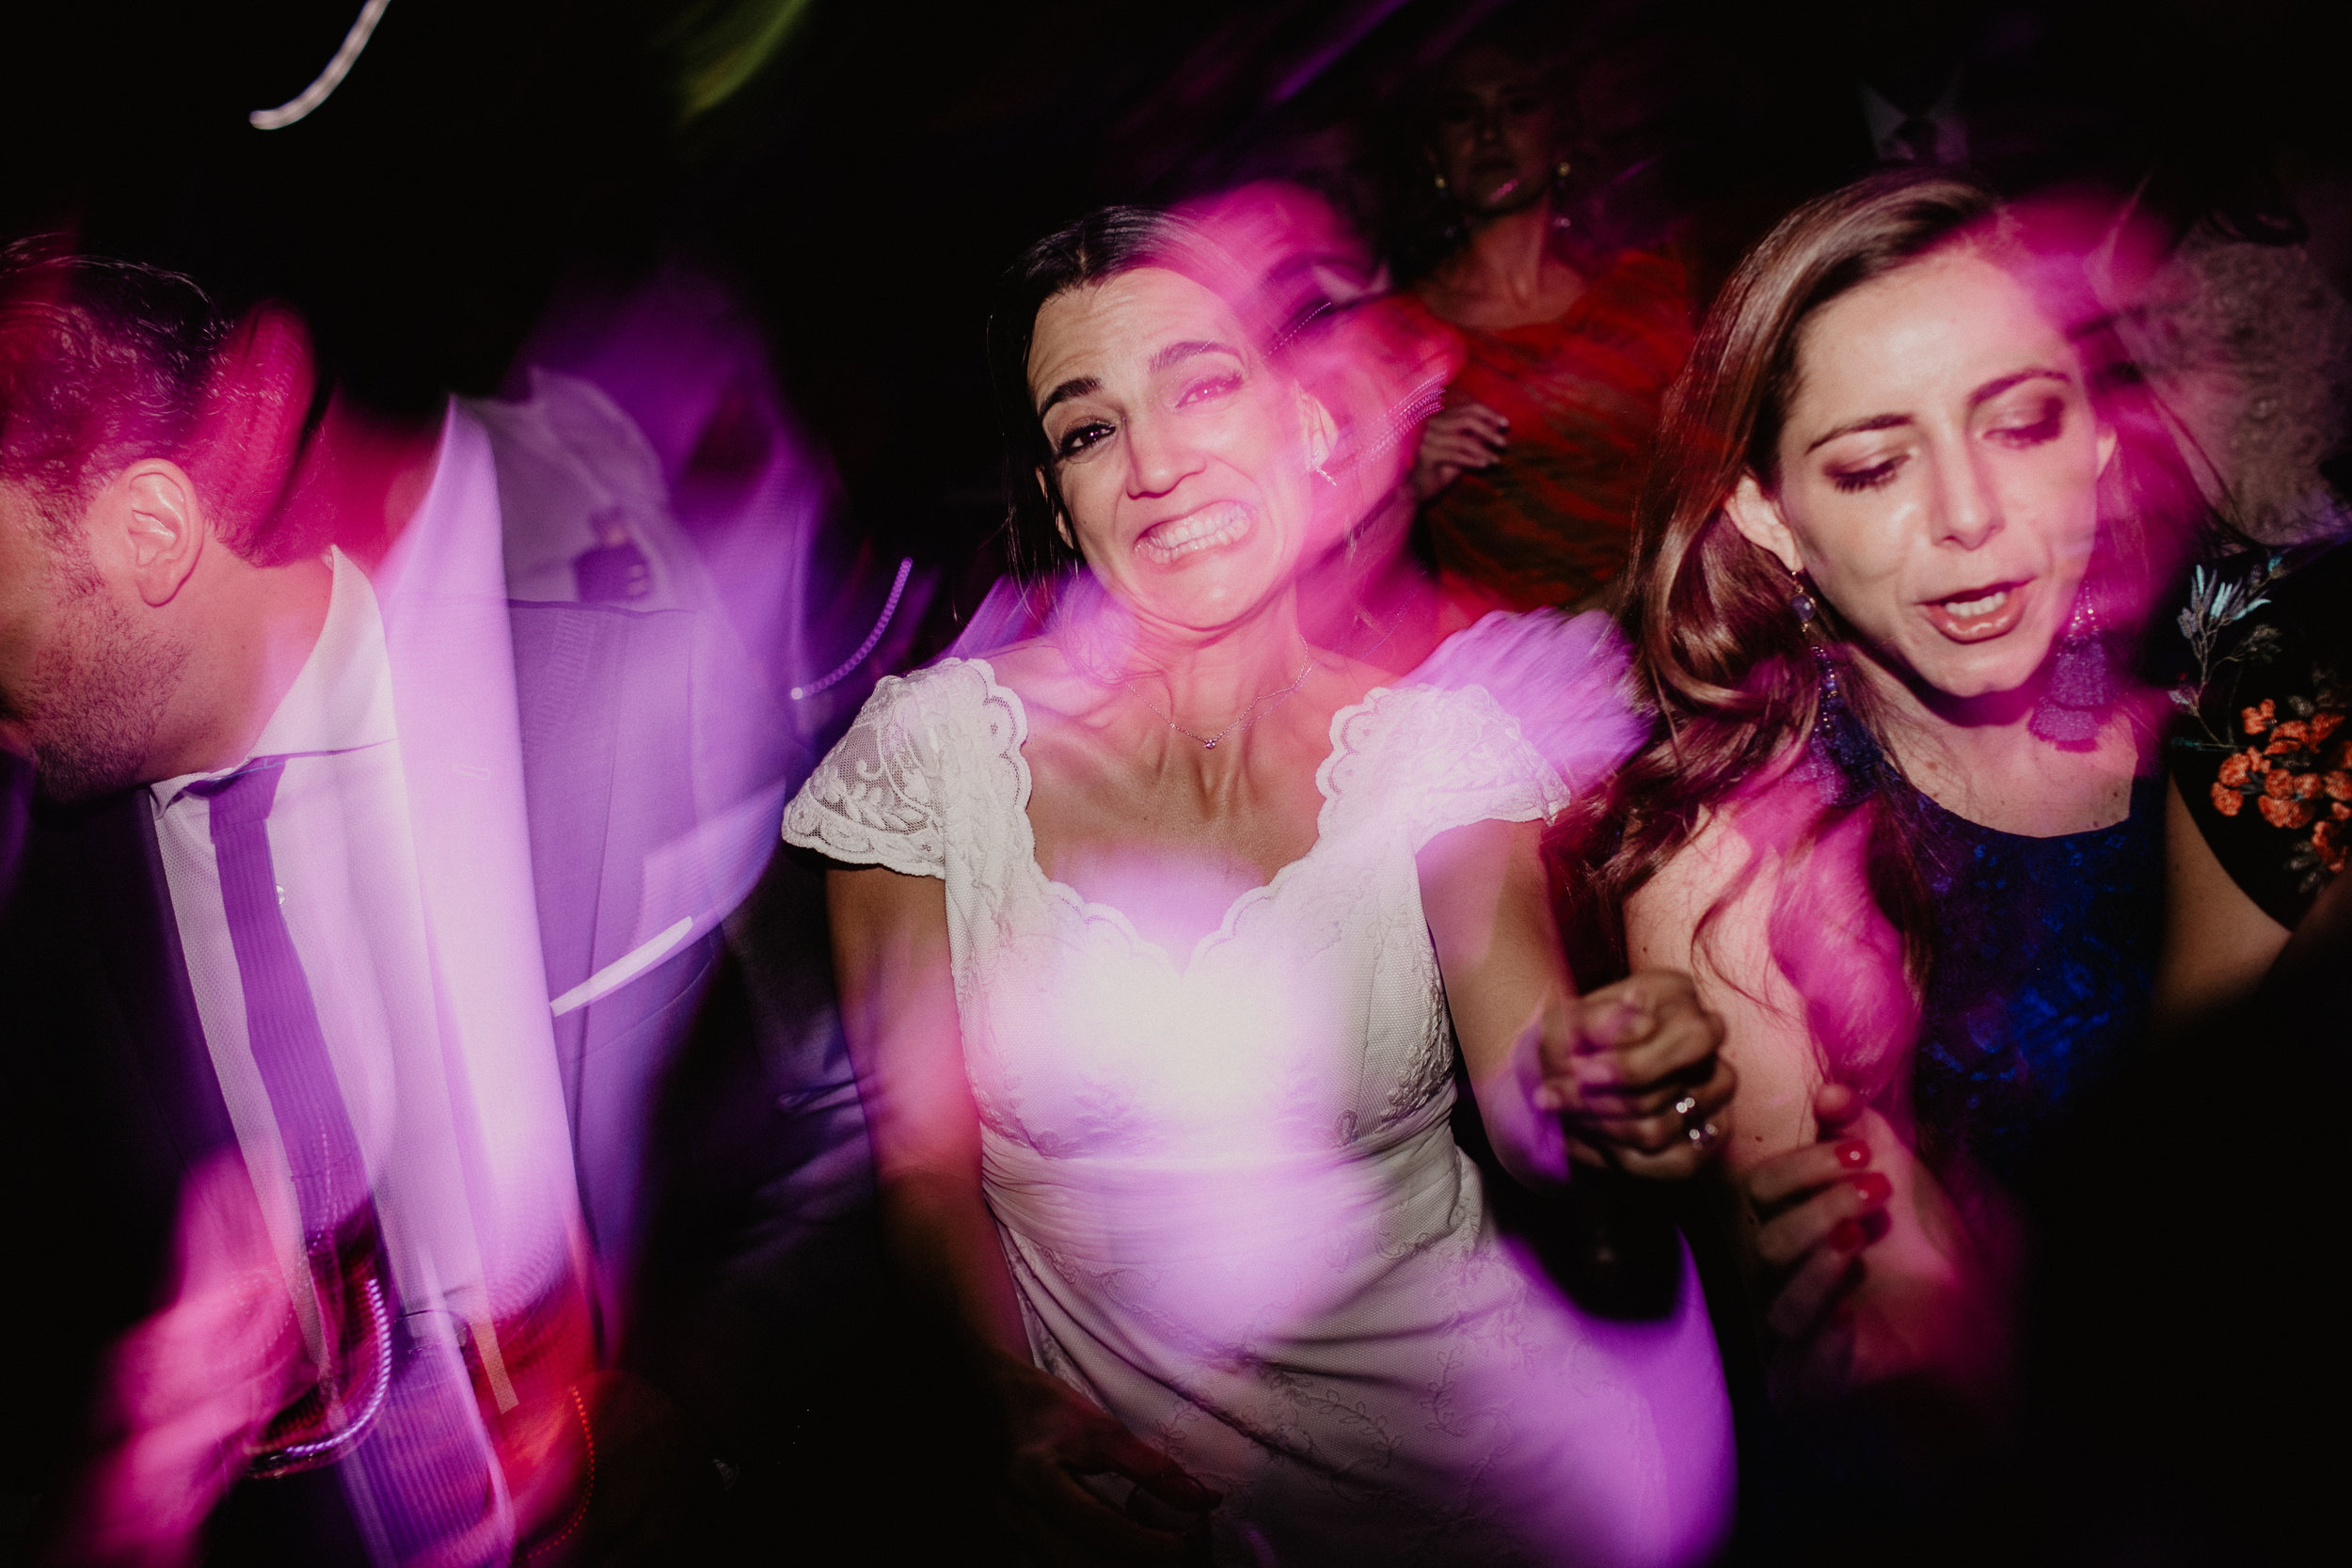 alfonso_flores_destination_wedding_photographer_pau_alonso_1103.JPG